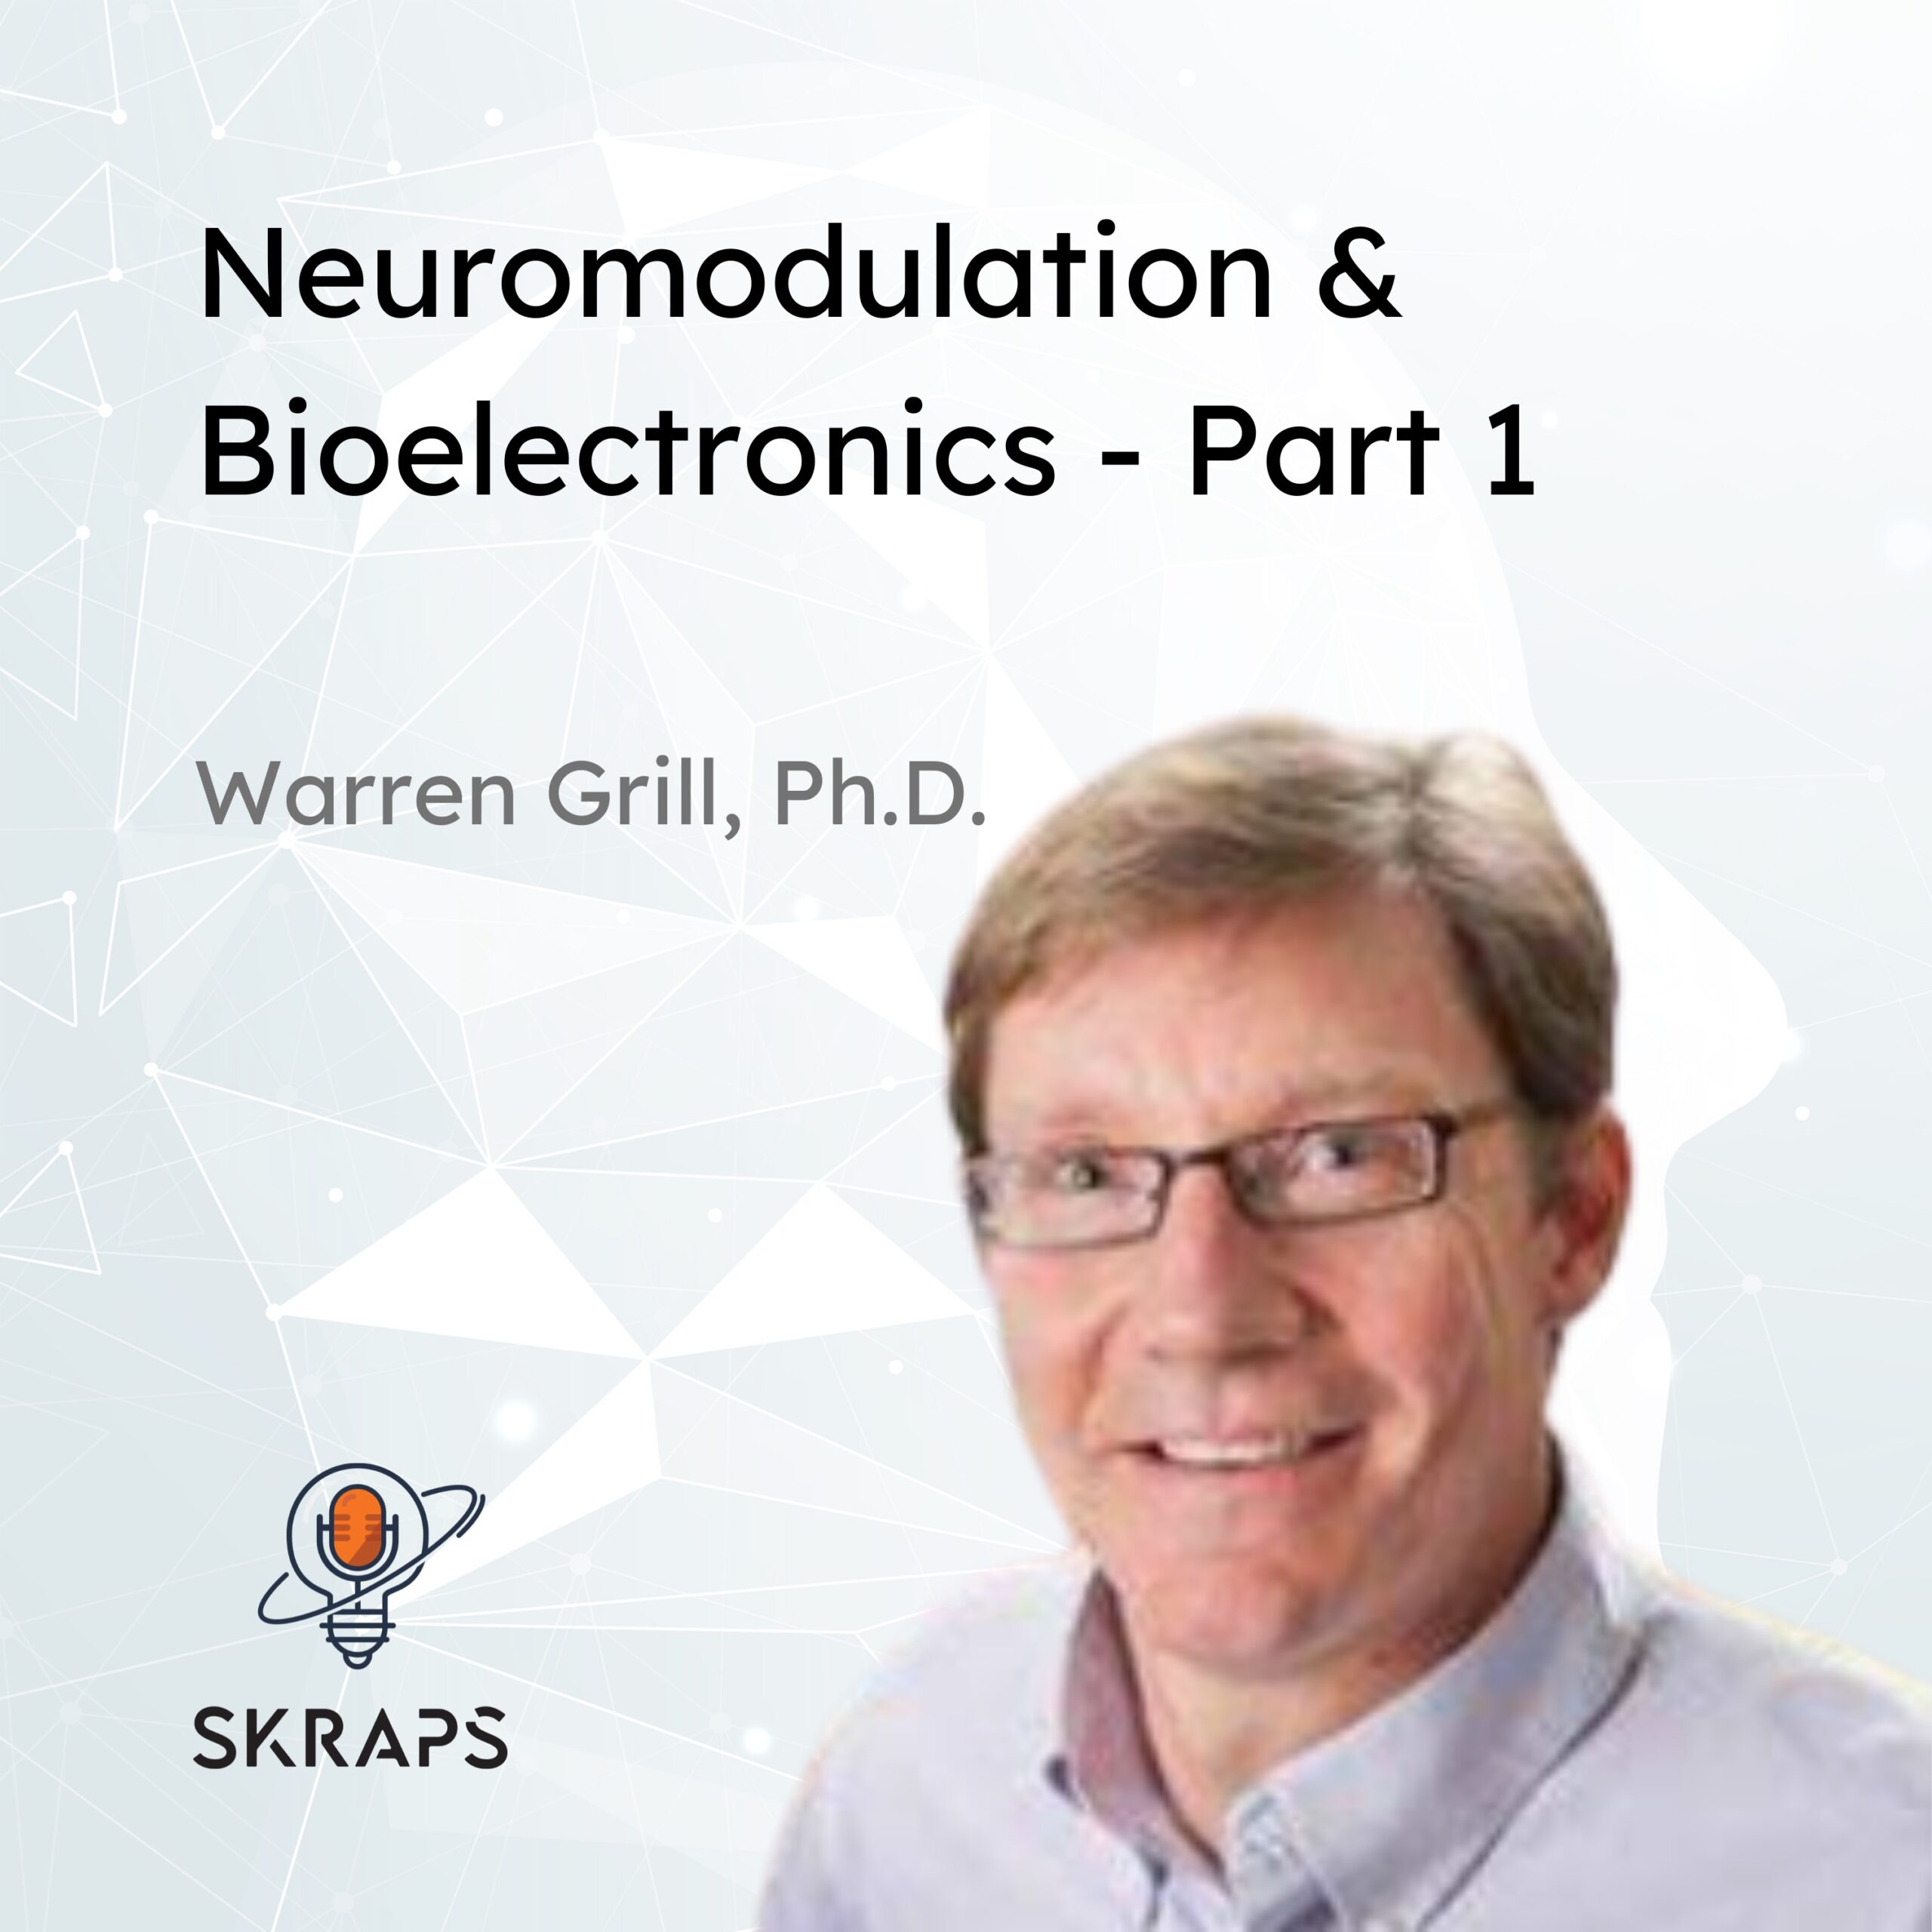 Neuromodulation and Bioelectronics